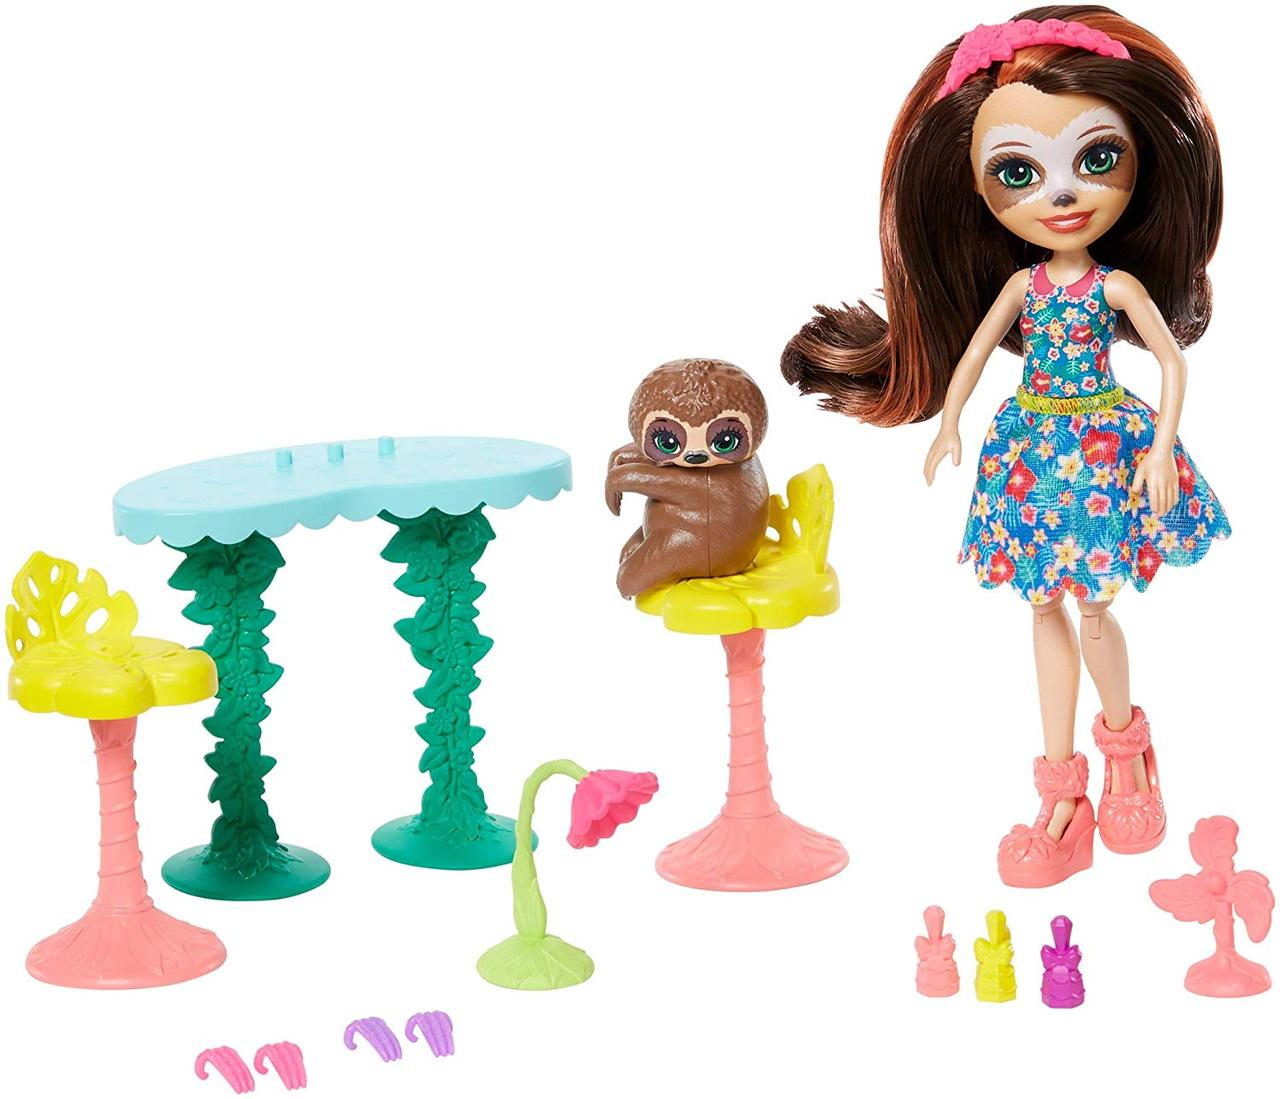 Enchantimals Салон красоты ленивец Сэла Ленни и Трибоди GFN54 Slow-Down Salon Sela Sloth Doll